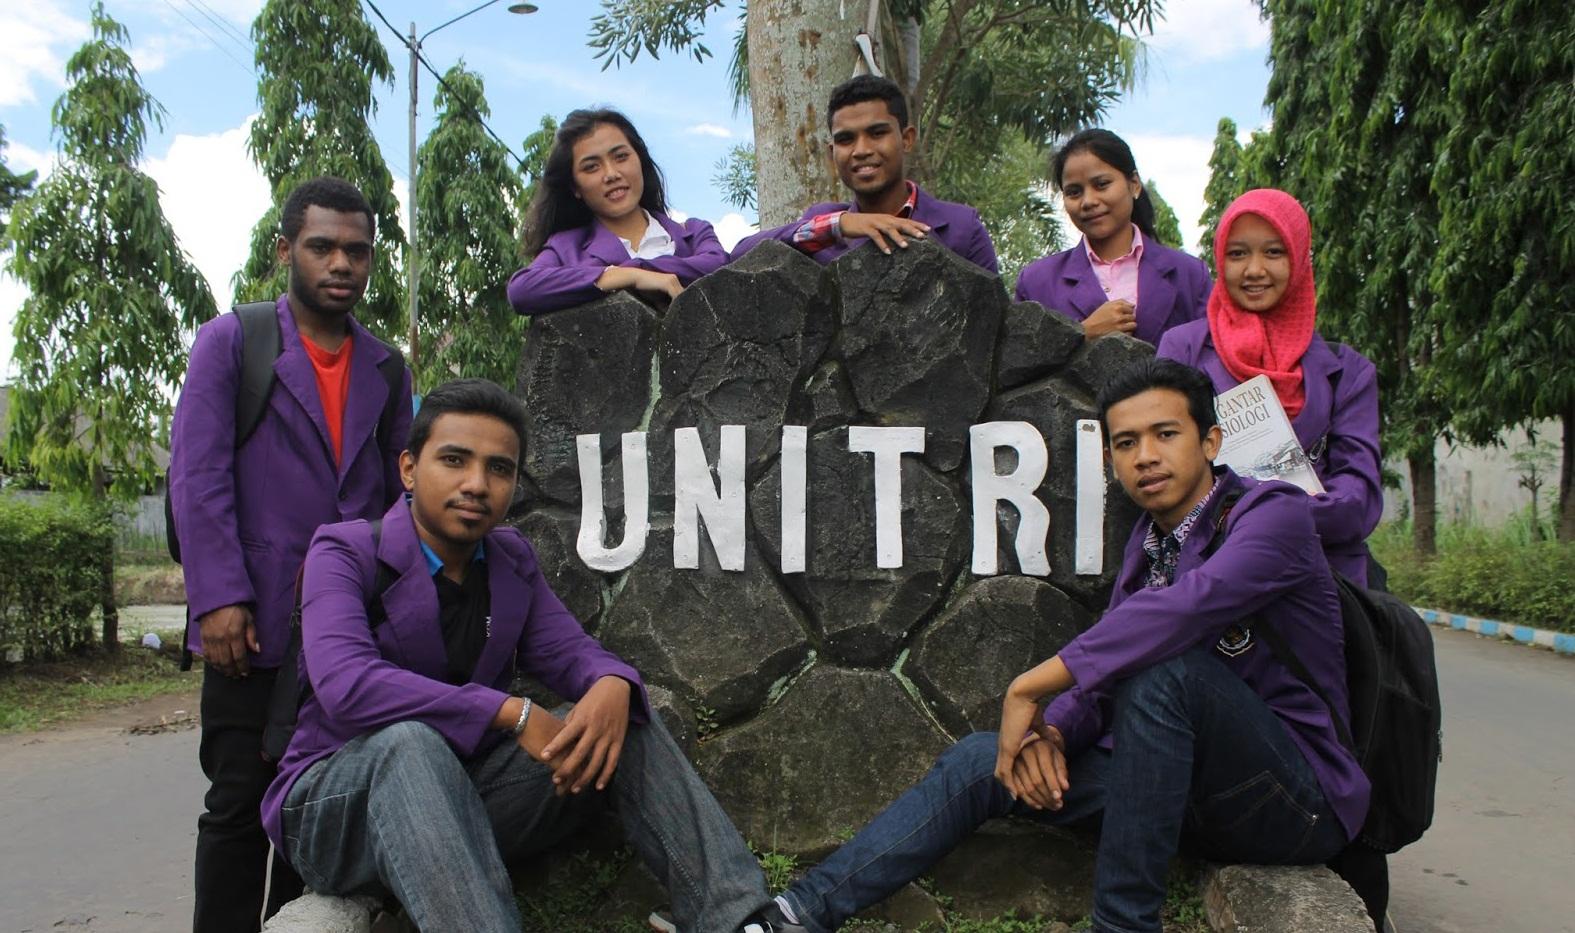 Biaya Kuliah Universitas Tribhuwana Tunggadewi (UNITRI) Malang